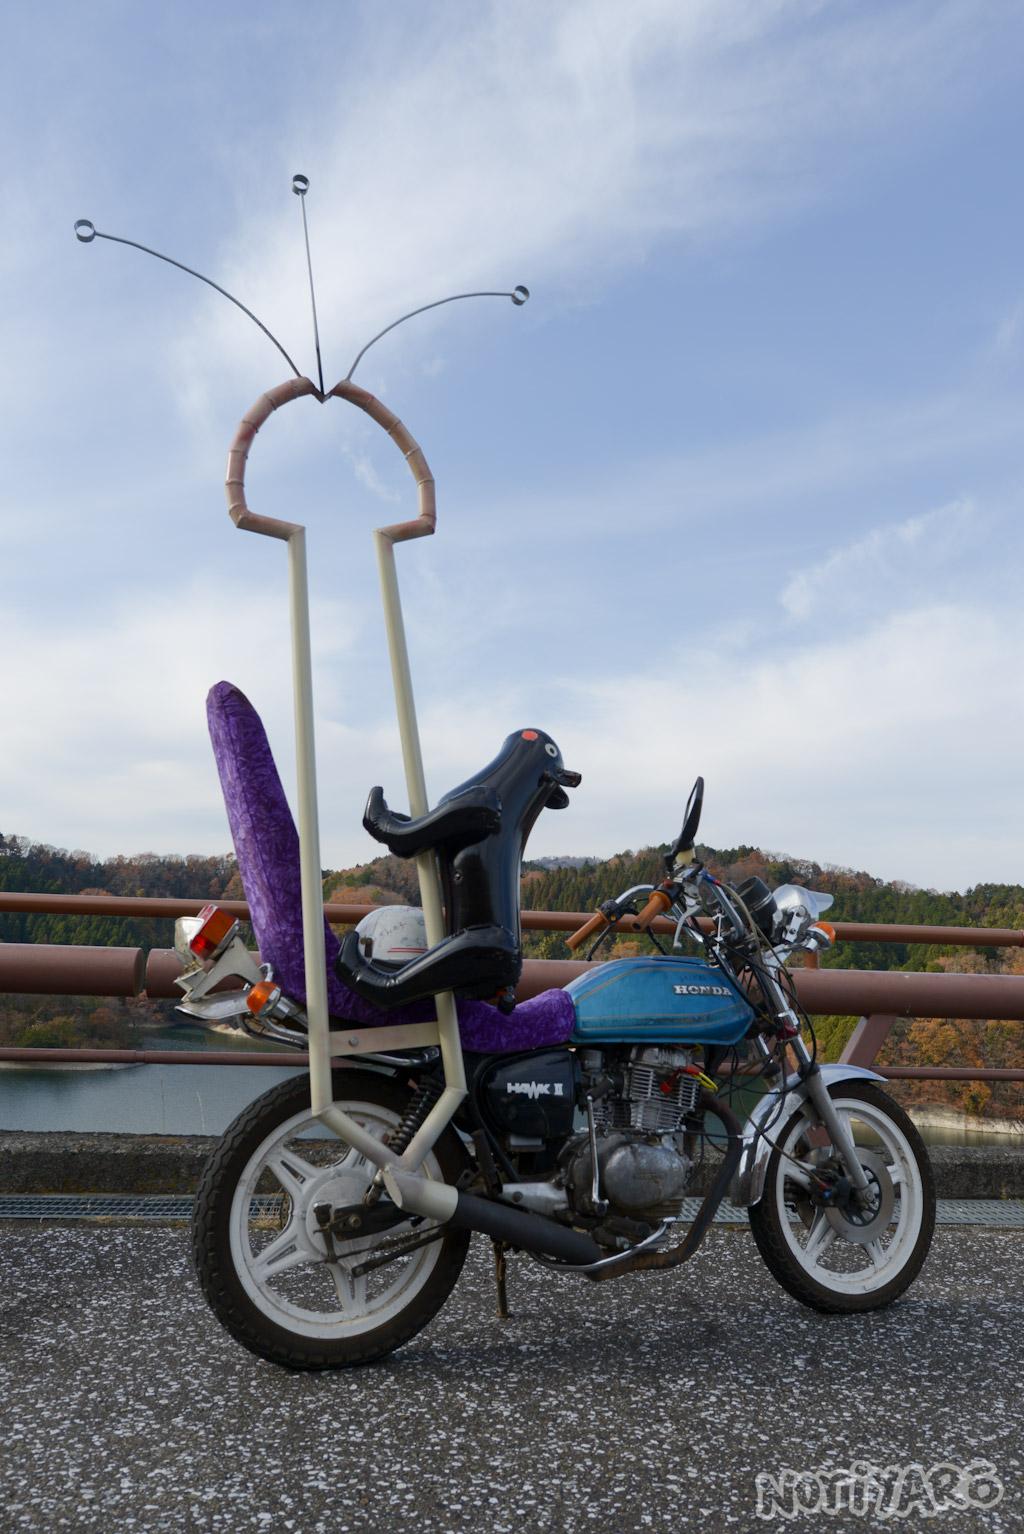 Modif Motor BosozokuJaps Style Sesungguhnya 5osials Blog